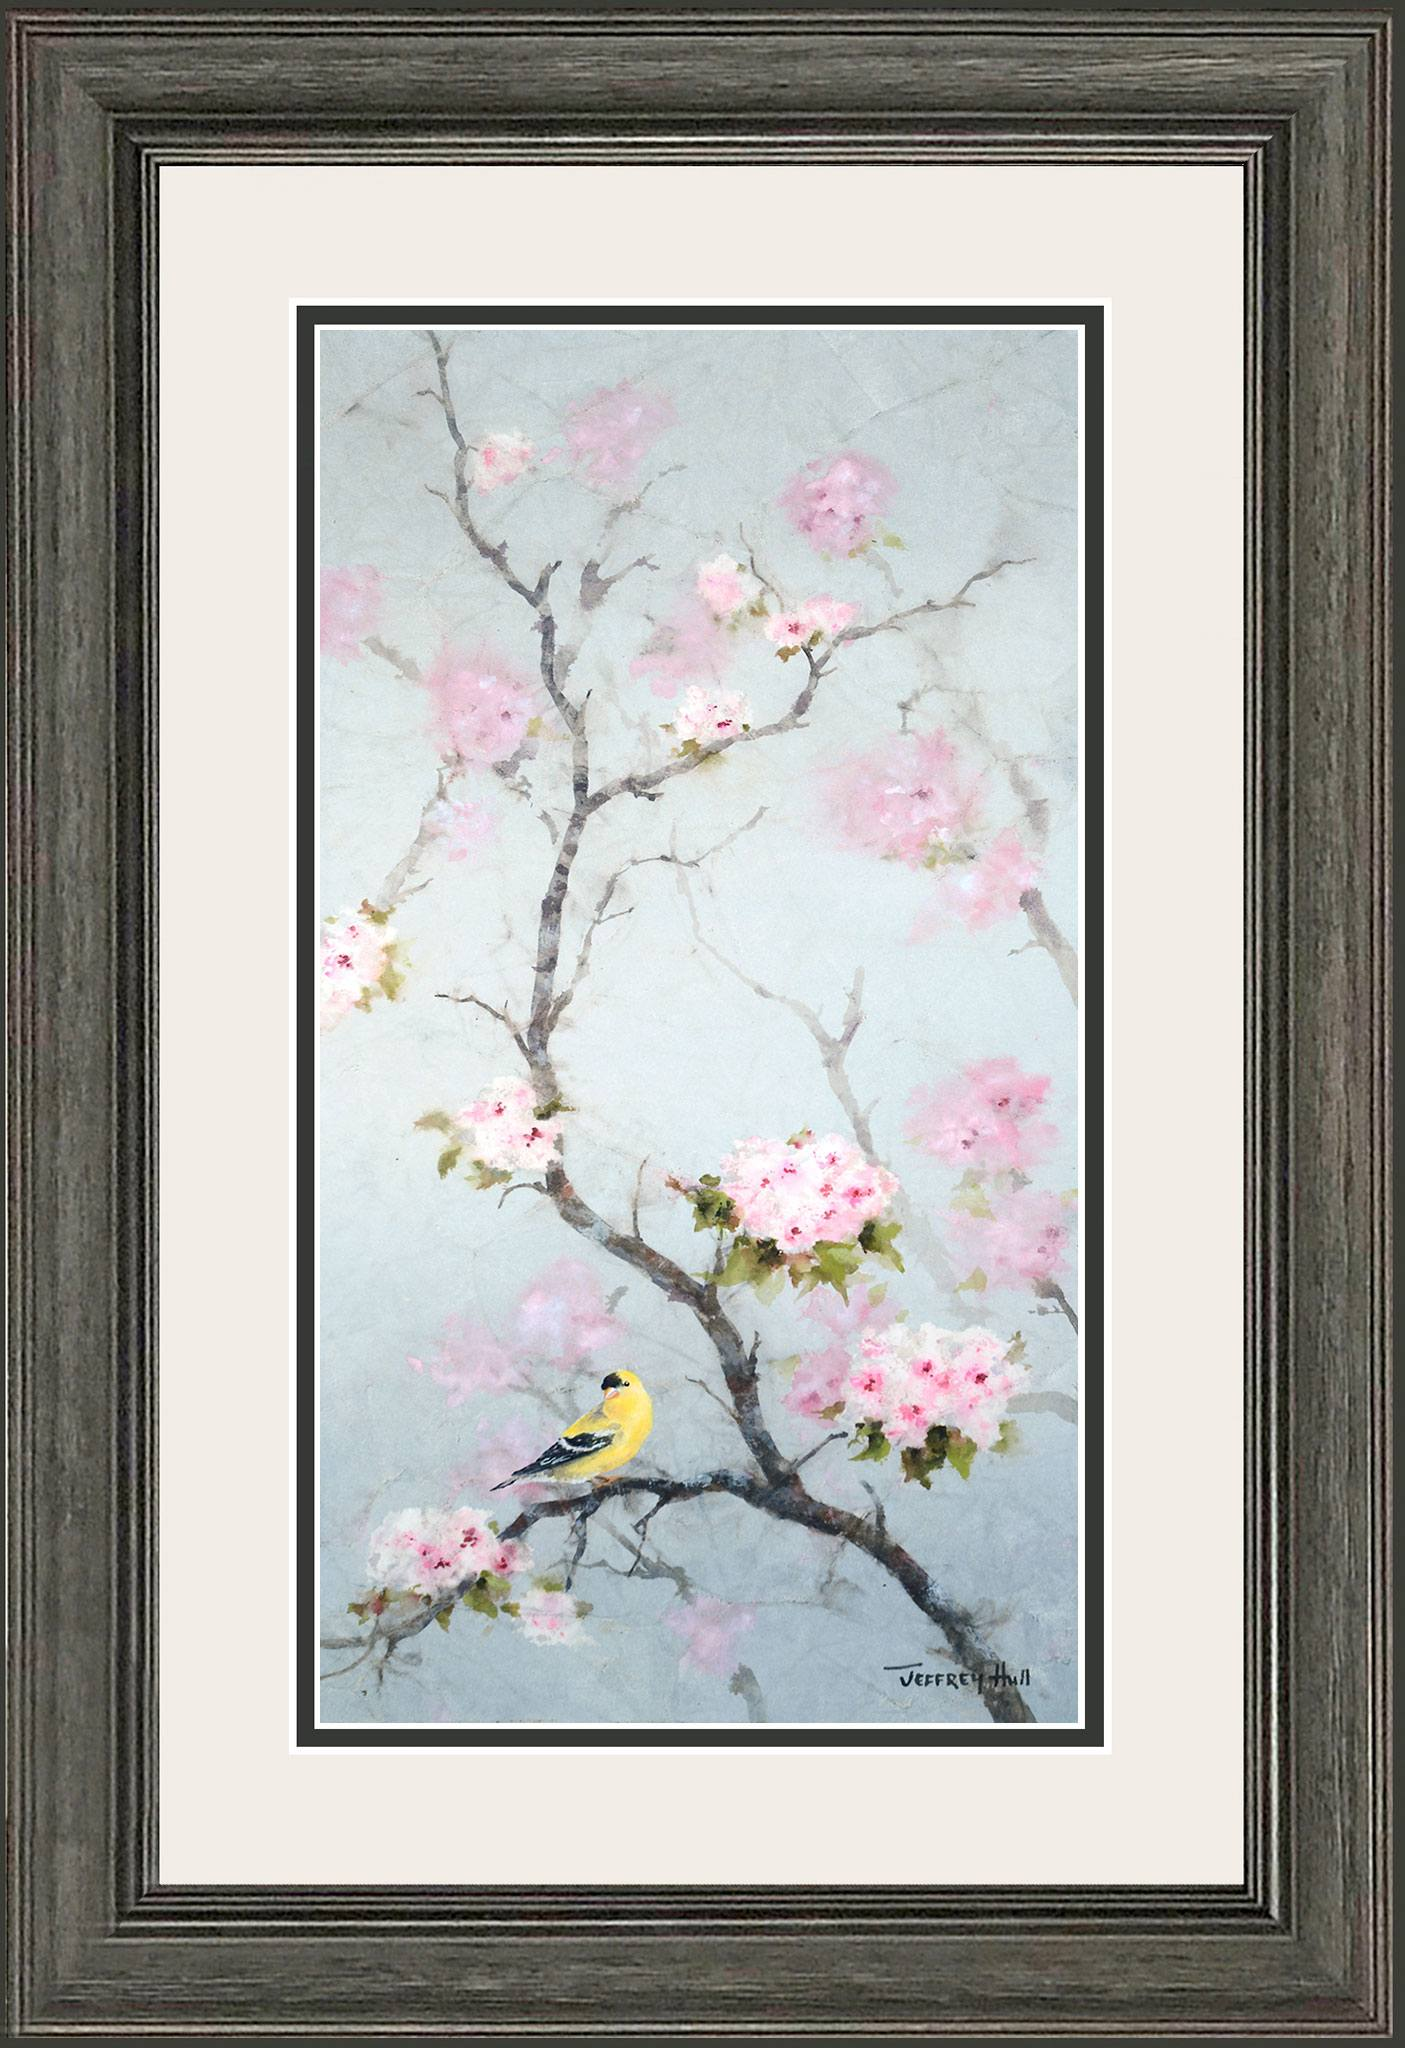 Goldfinch-_-Cherry-Blossoms-OpenEd-Cascade-Talc-Dark-Shale-4-Website-2021